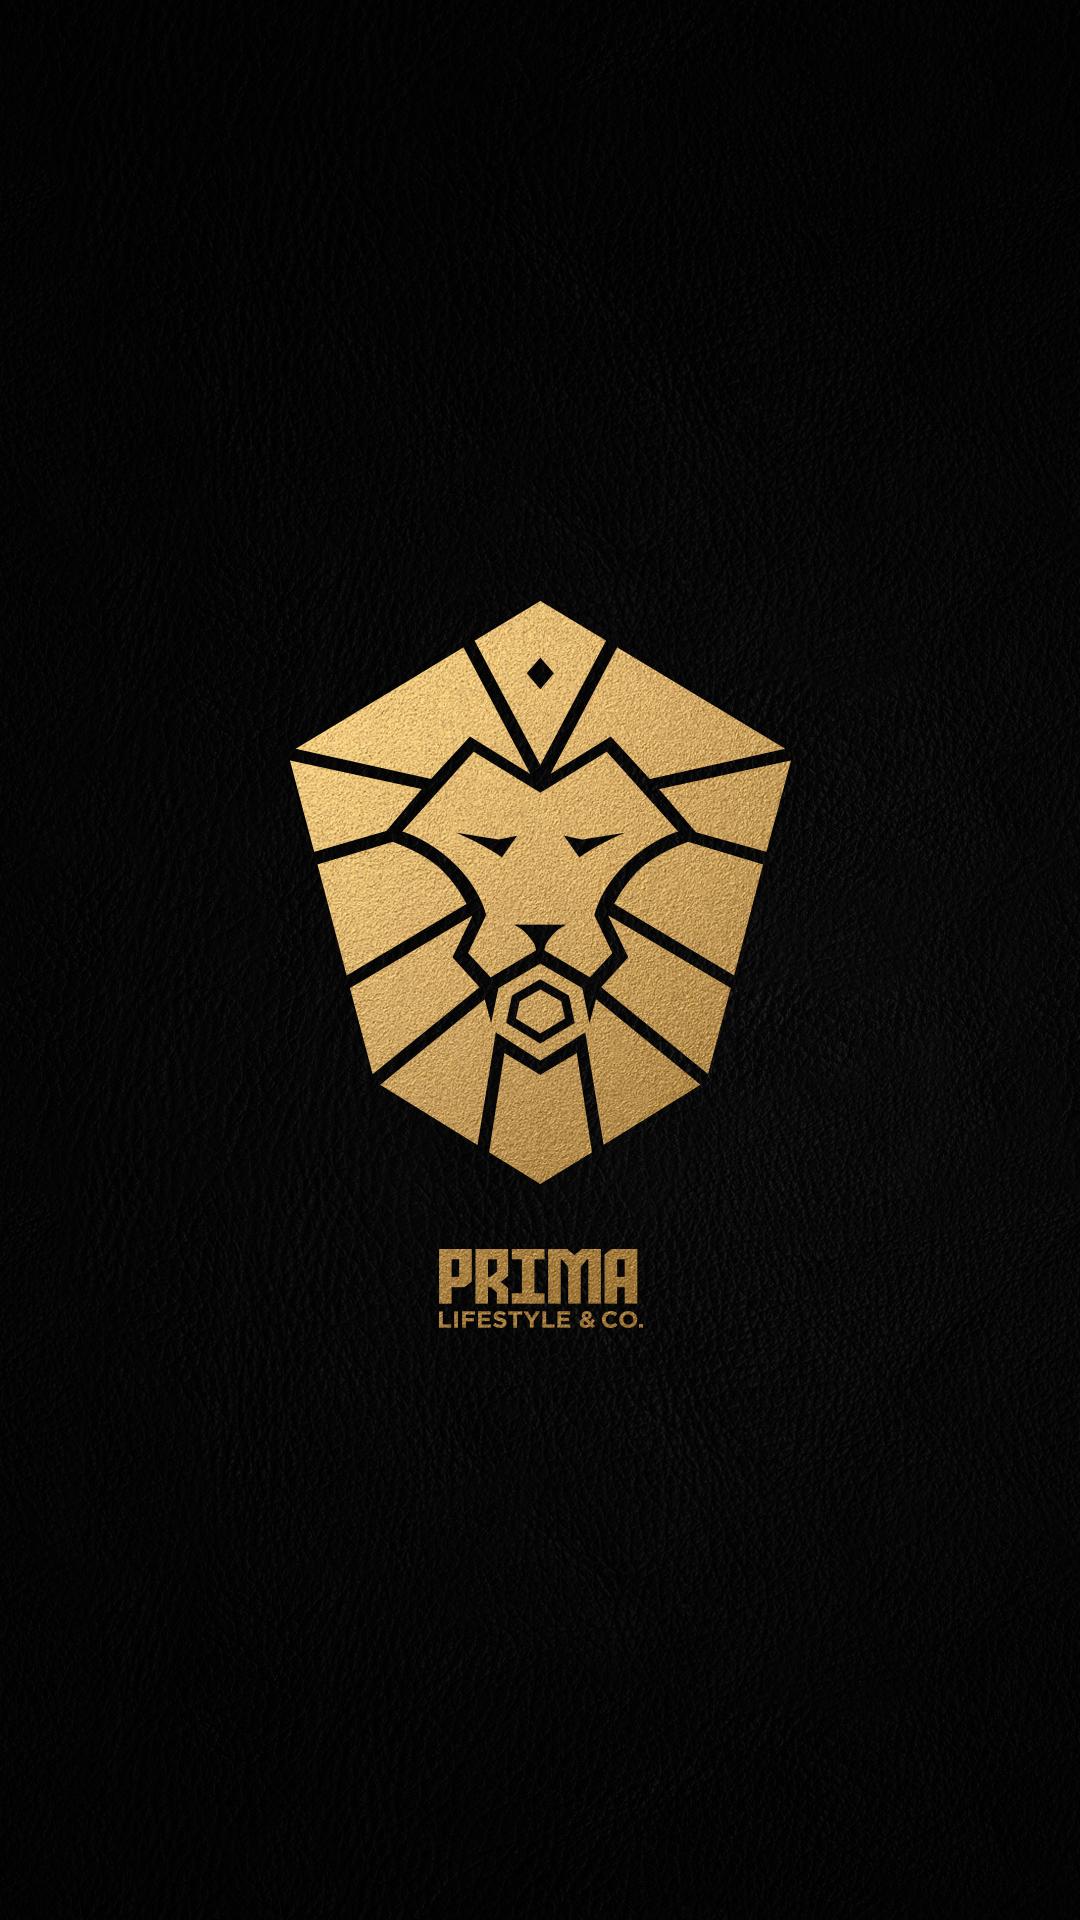 PRIMA_Lifestyle_bg5.jpg